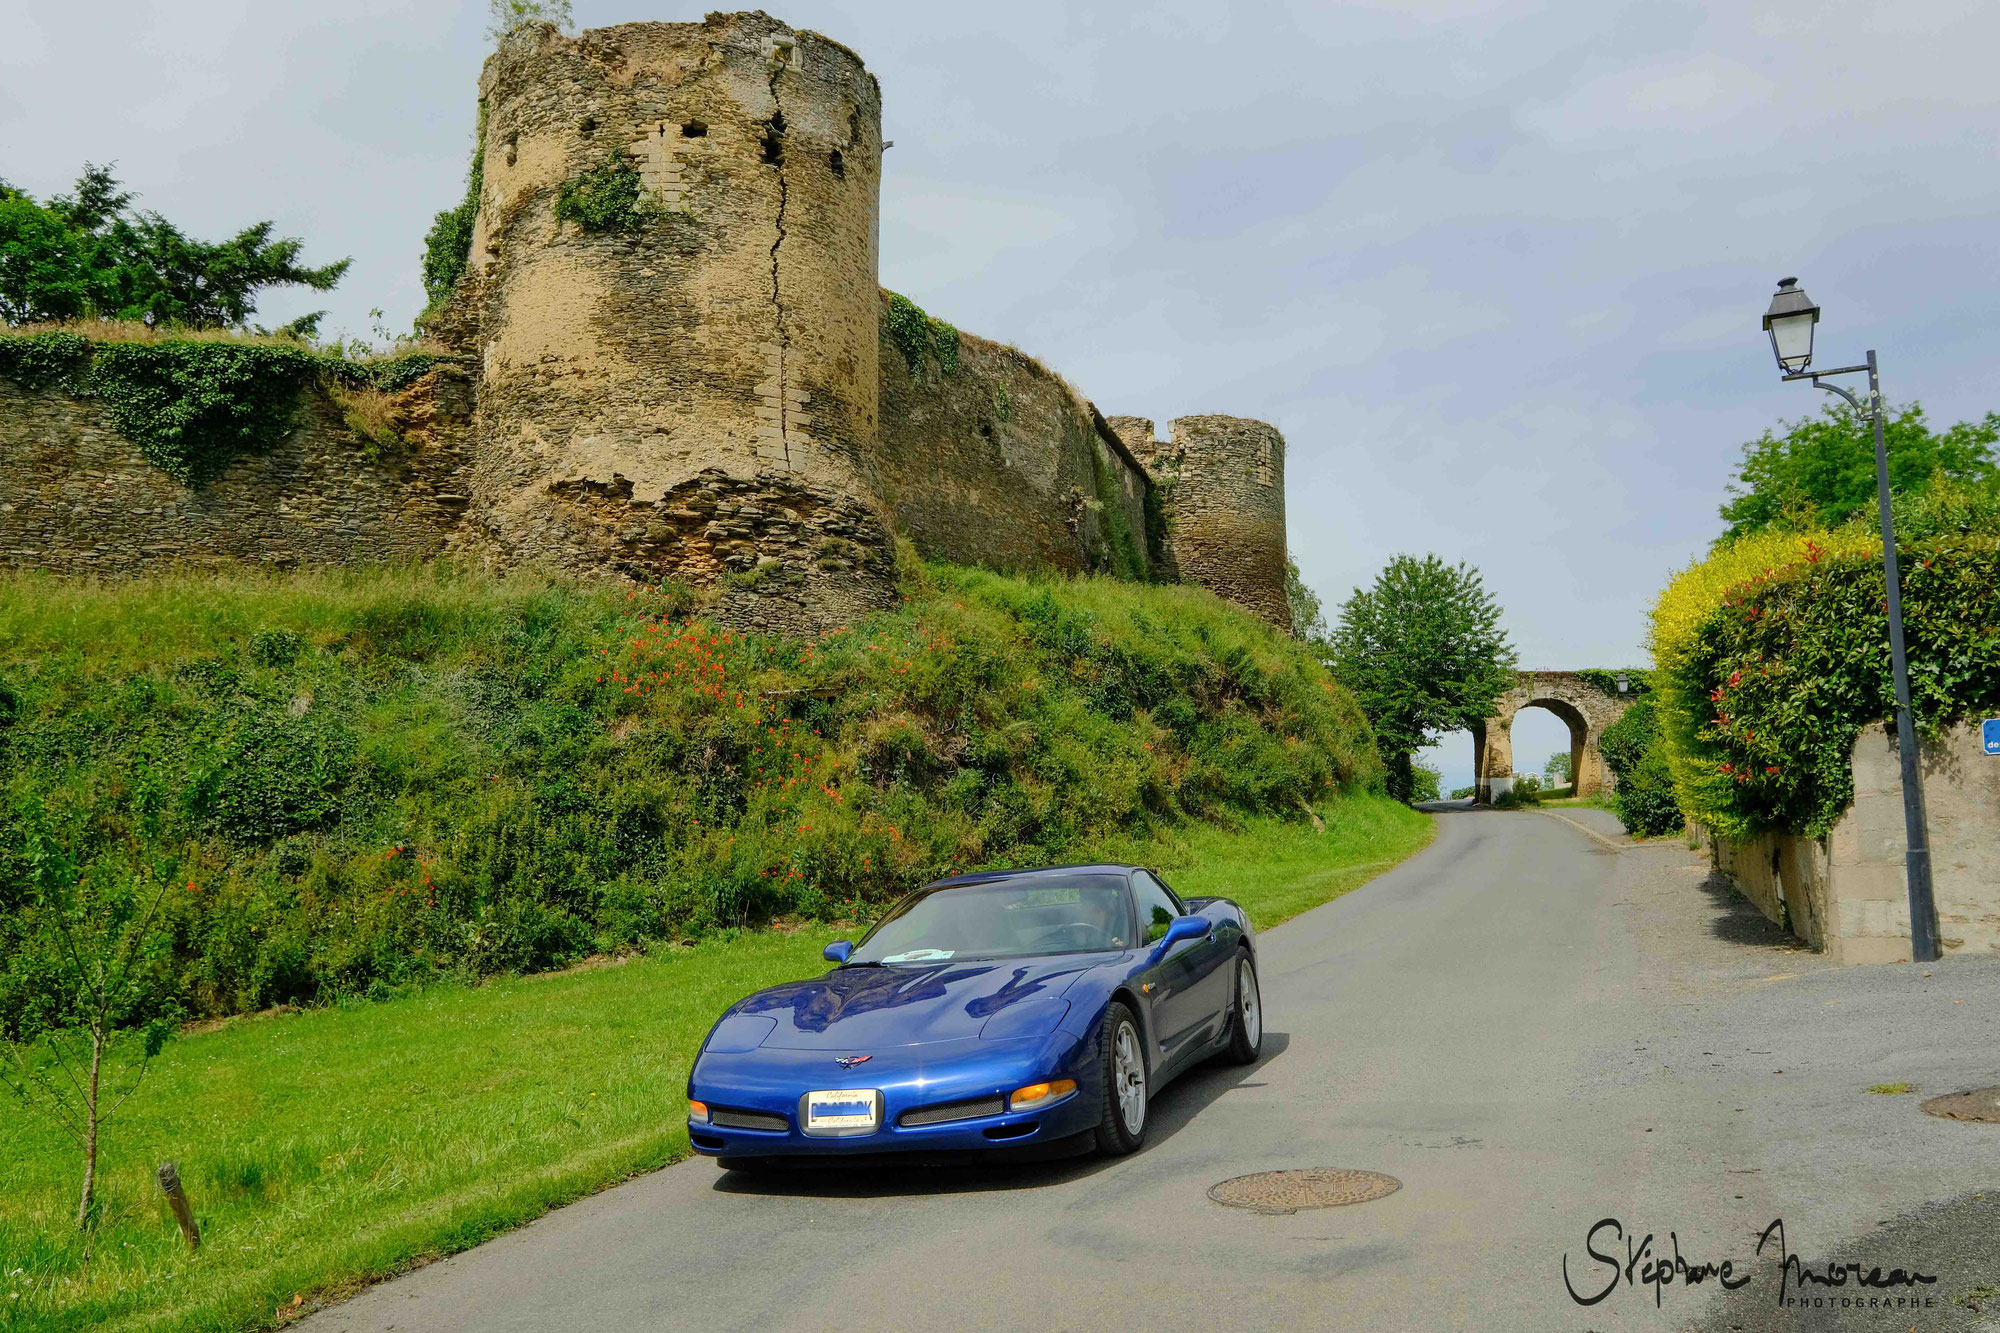 Les Anglaises invitent ... le Rallye Oenotouristique